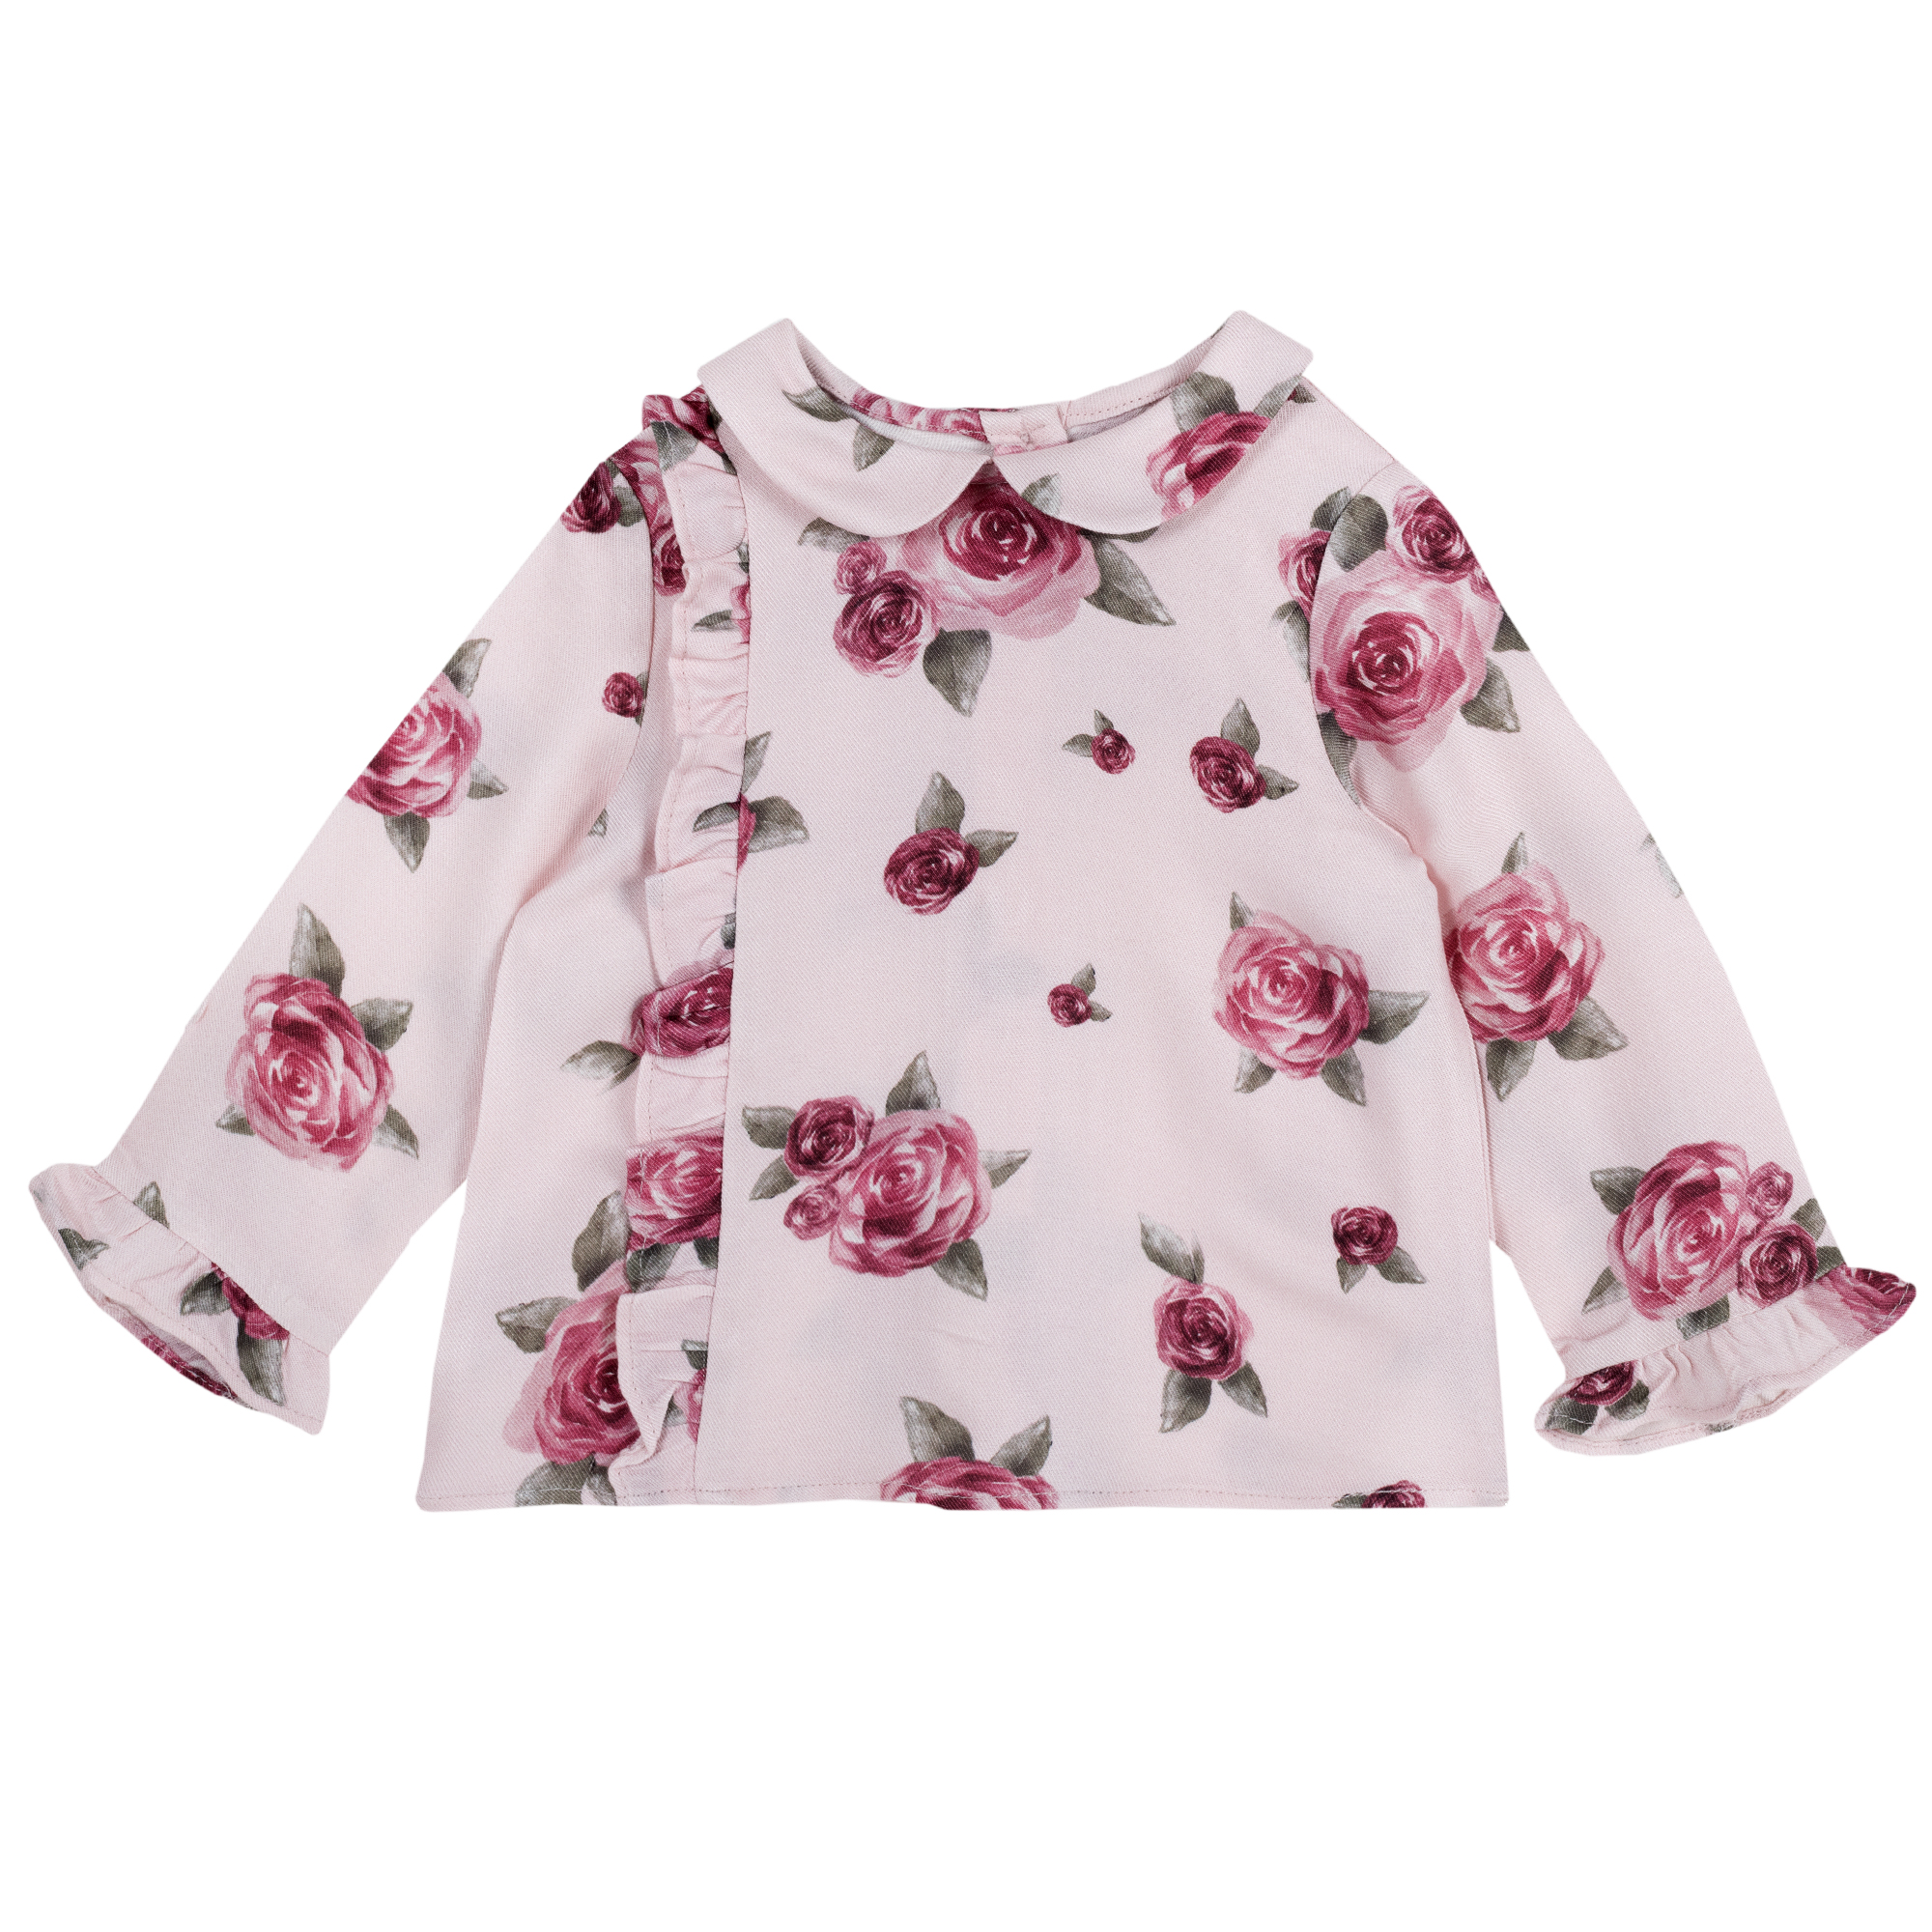 Camasa Copii Chicco, Roz Cu Trandafiri imagine